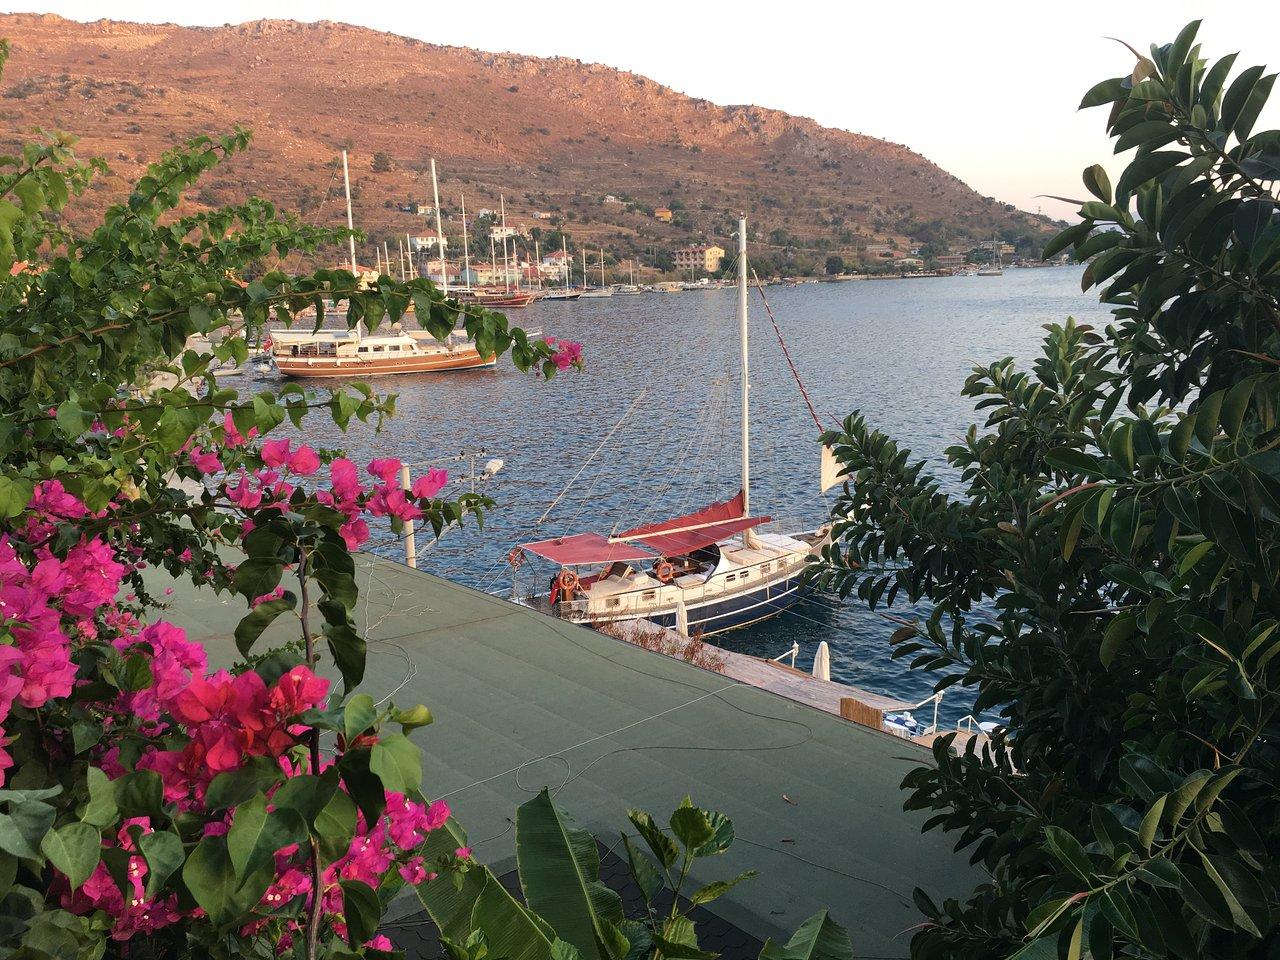 Turkey. Hotel Dolphin. Photos and reviews 35